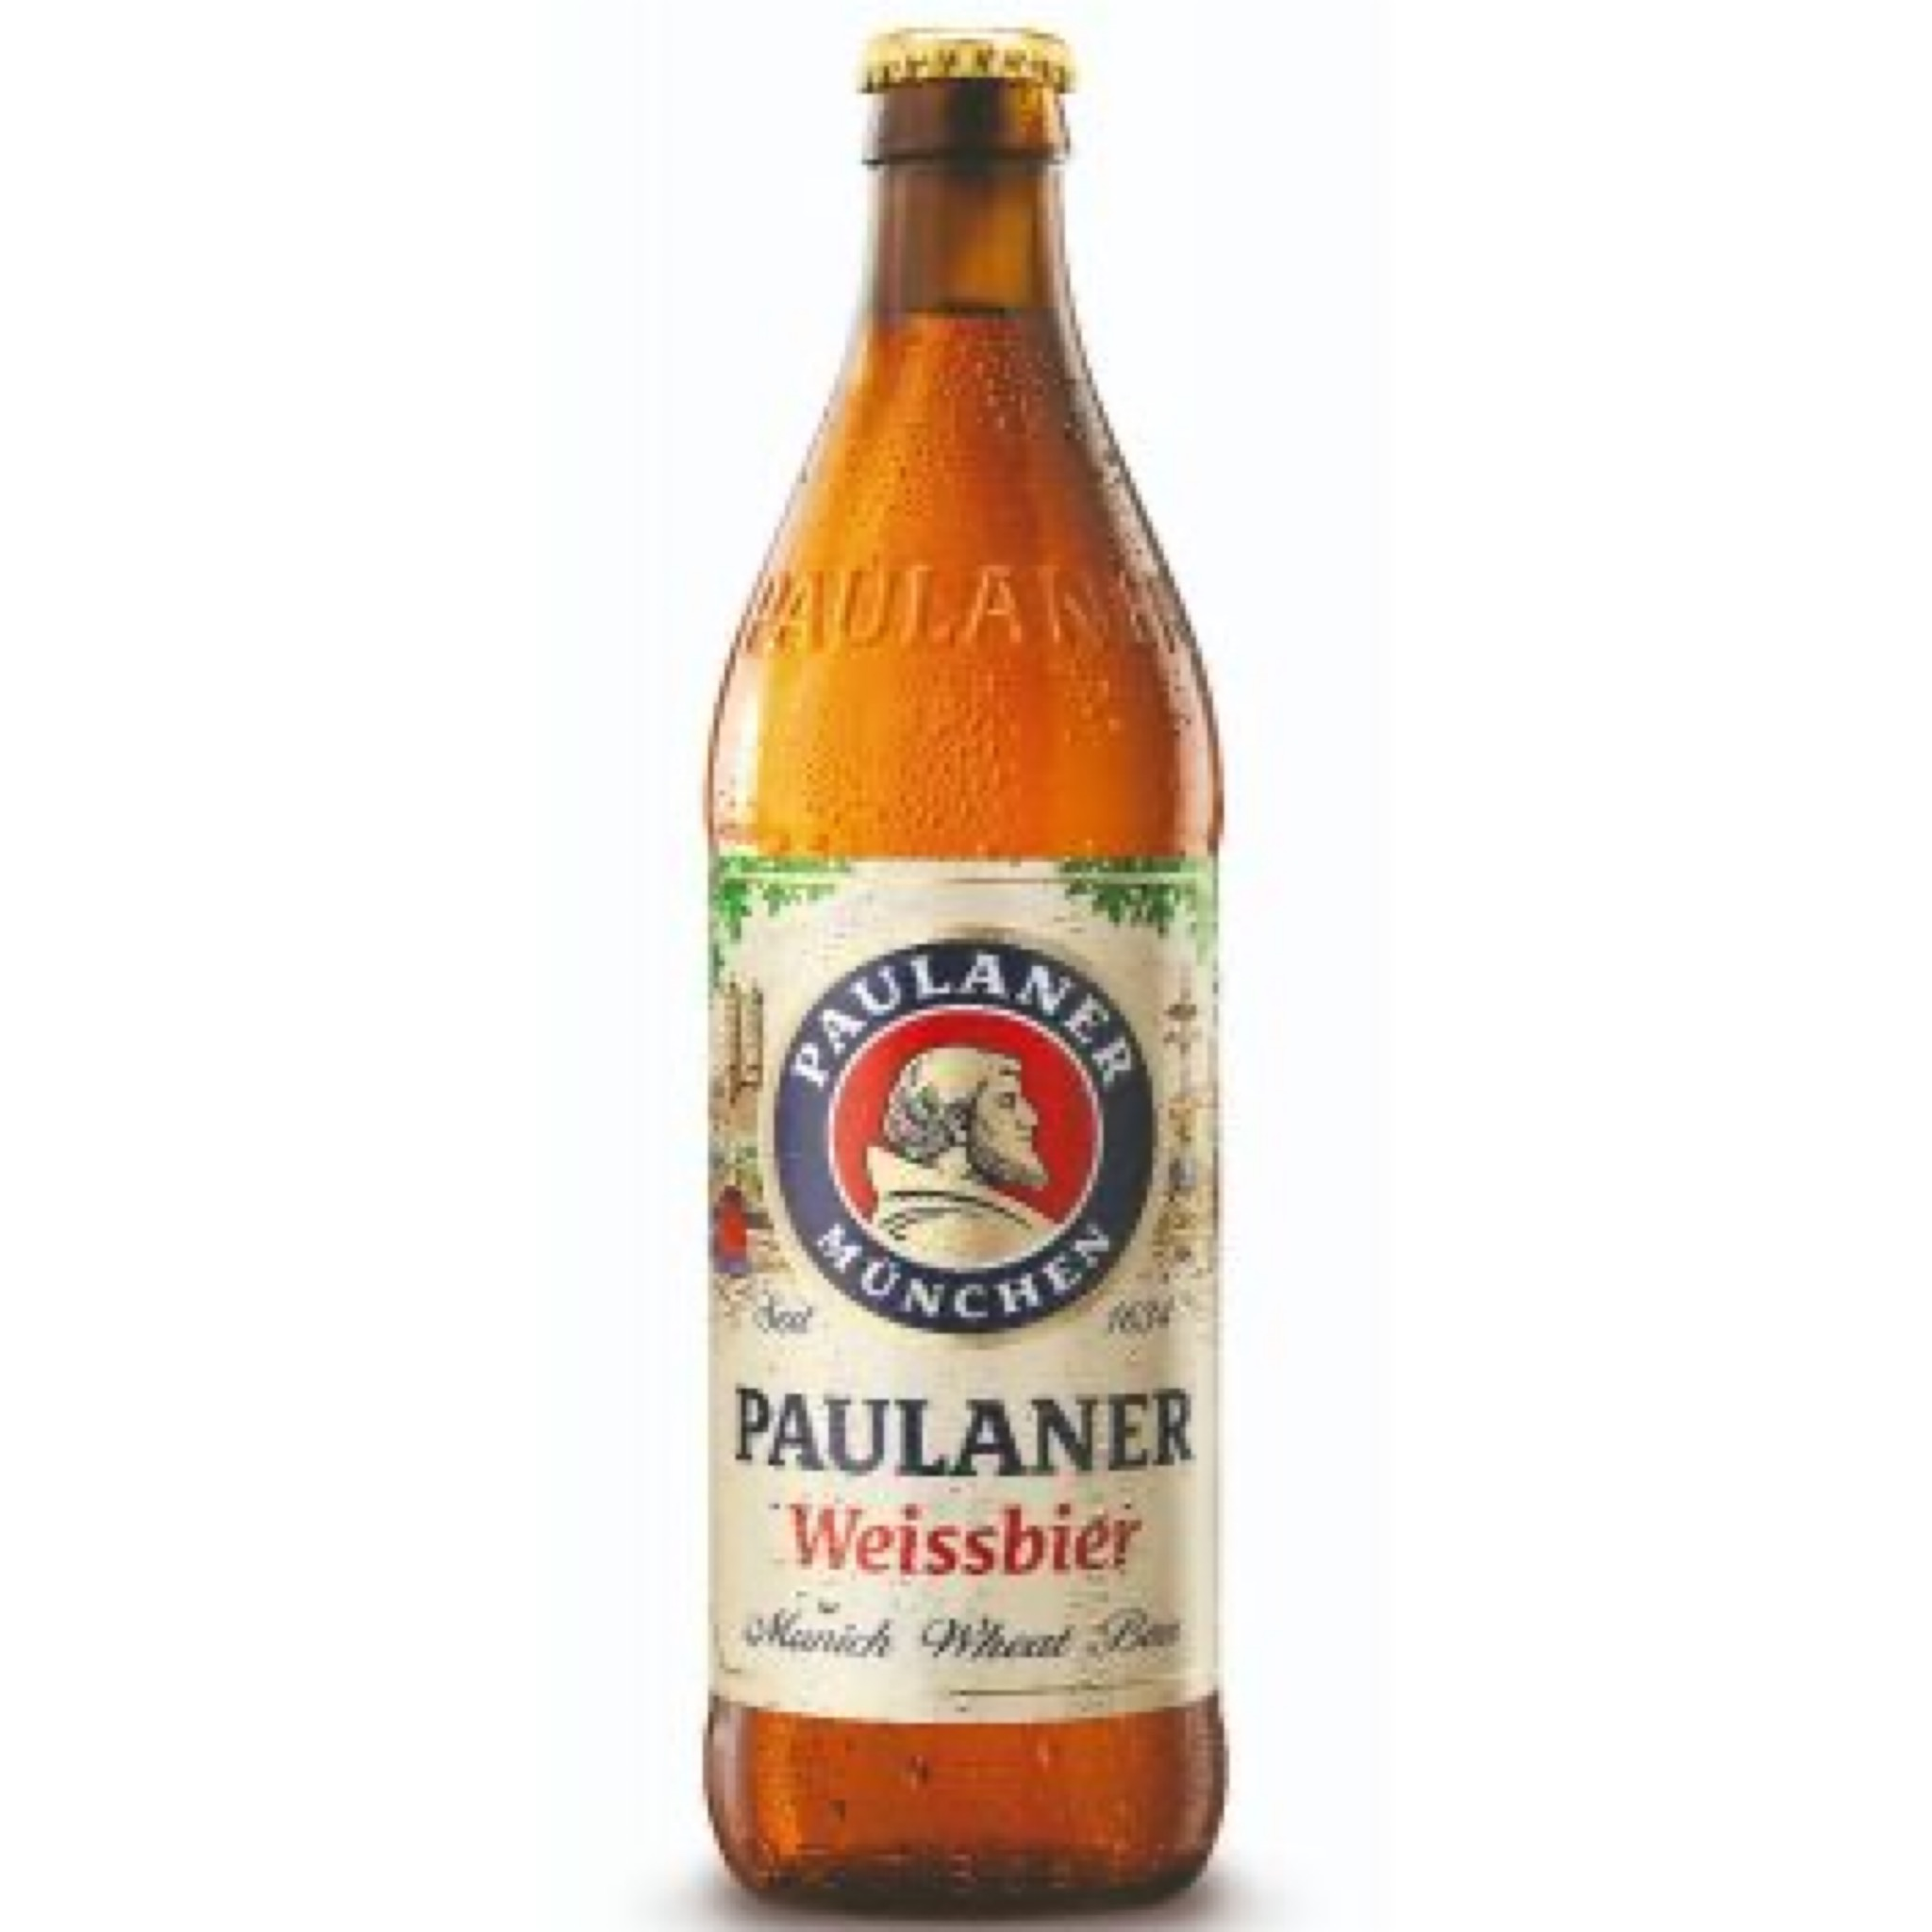 Paulaner Weisse 5.5% 500ml